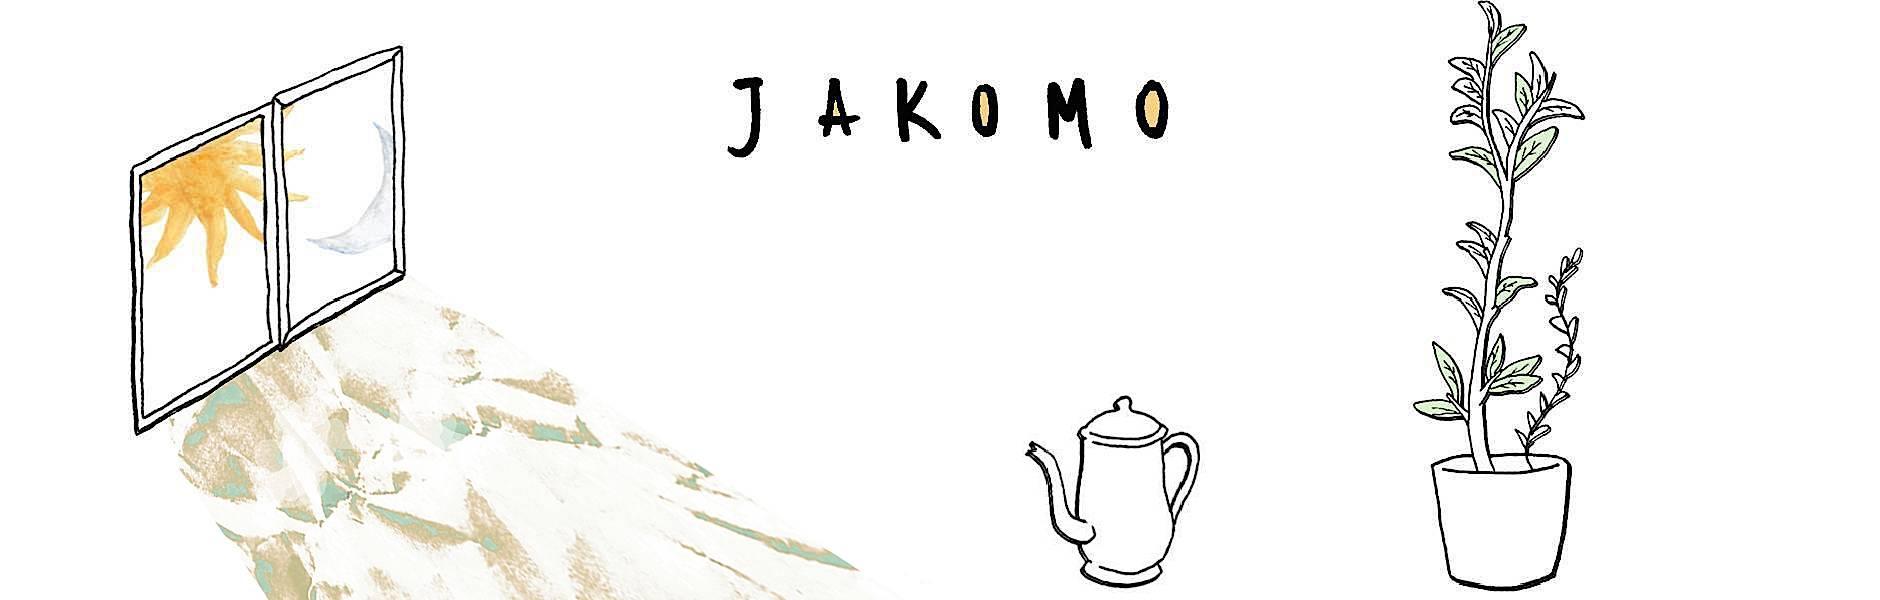 JAKOMO